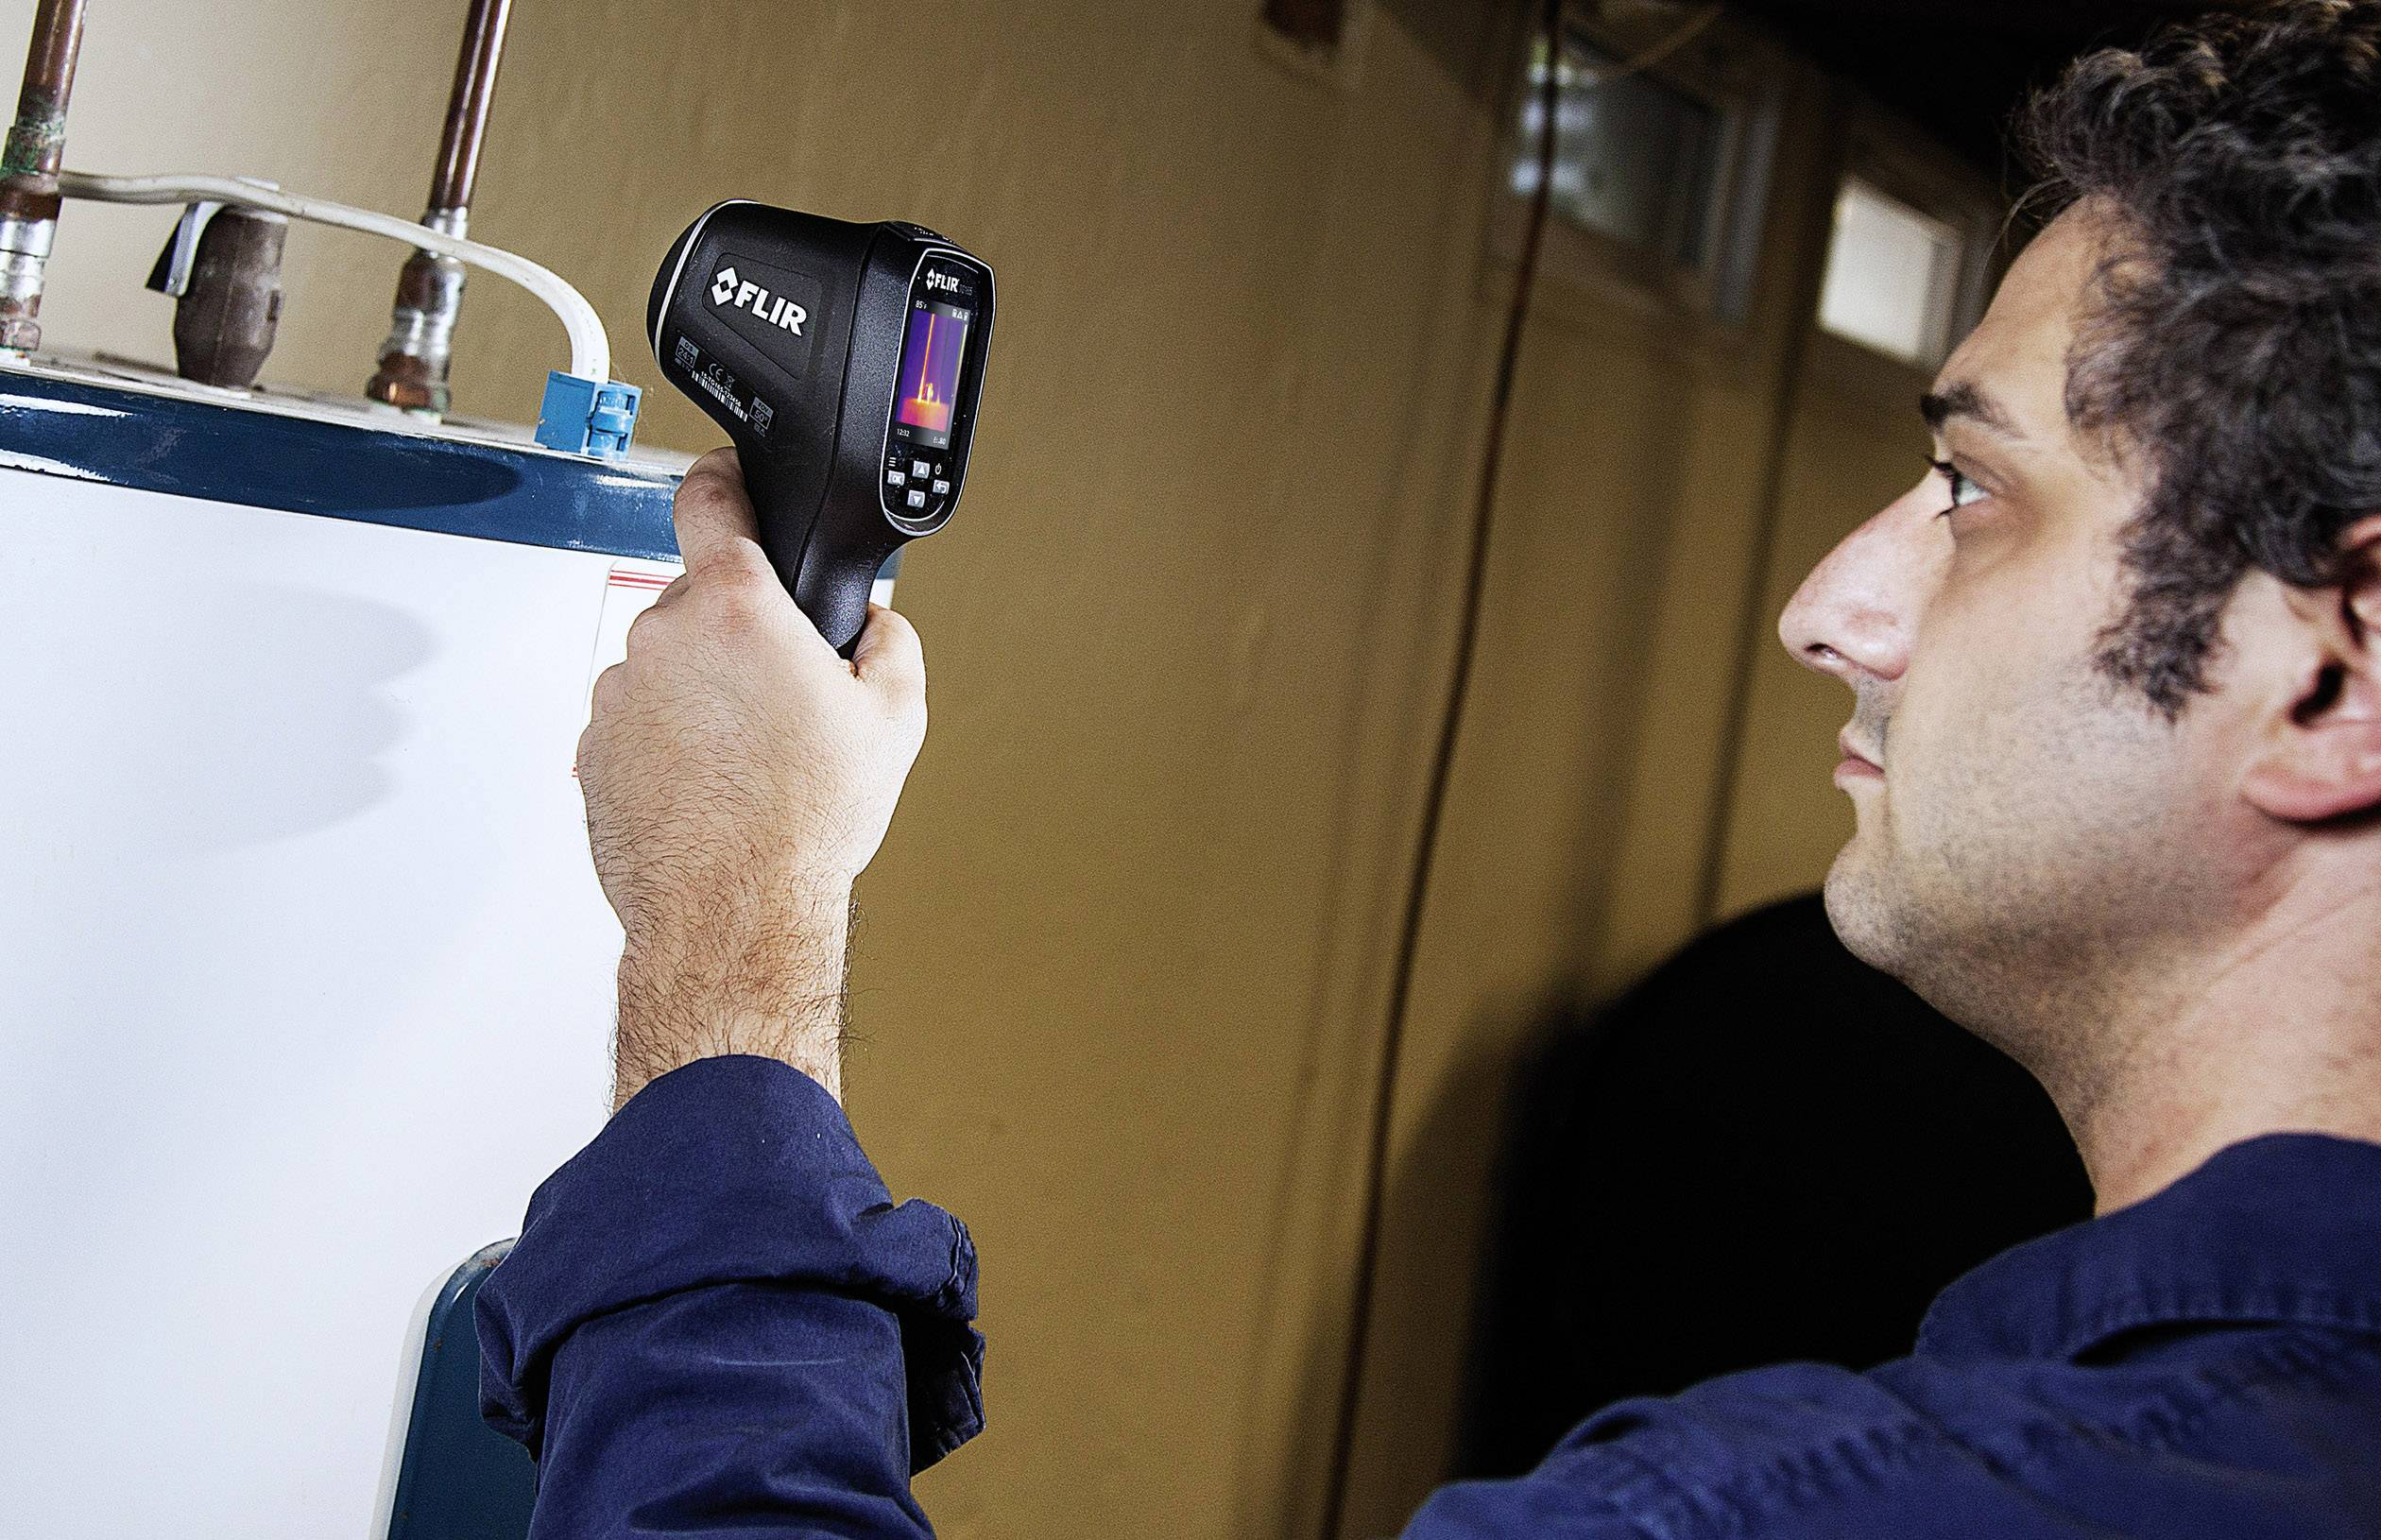 Vizuální infračervený teploměr FLIR TG165, Optika 24:1, -25 až +380 °C, pyrometr